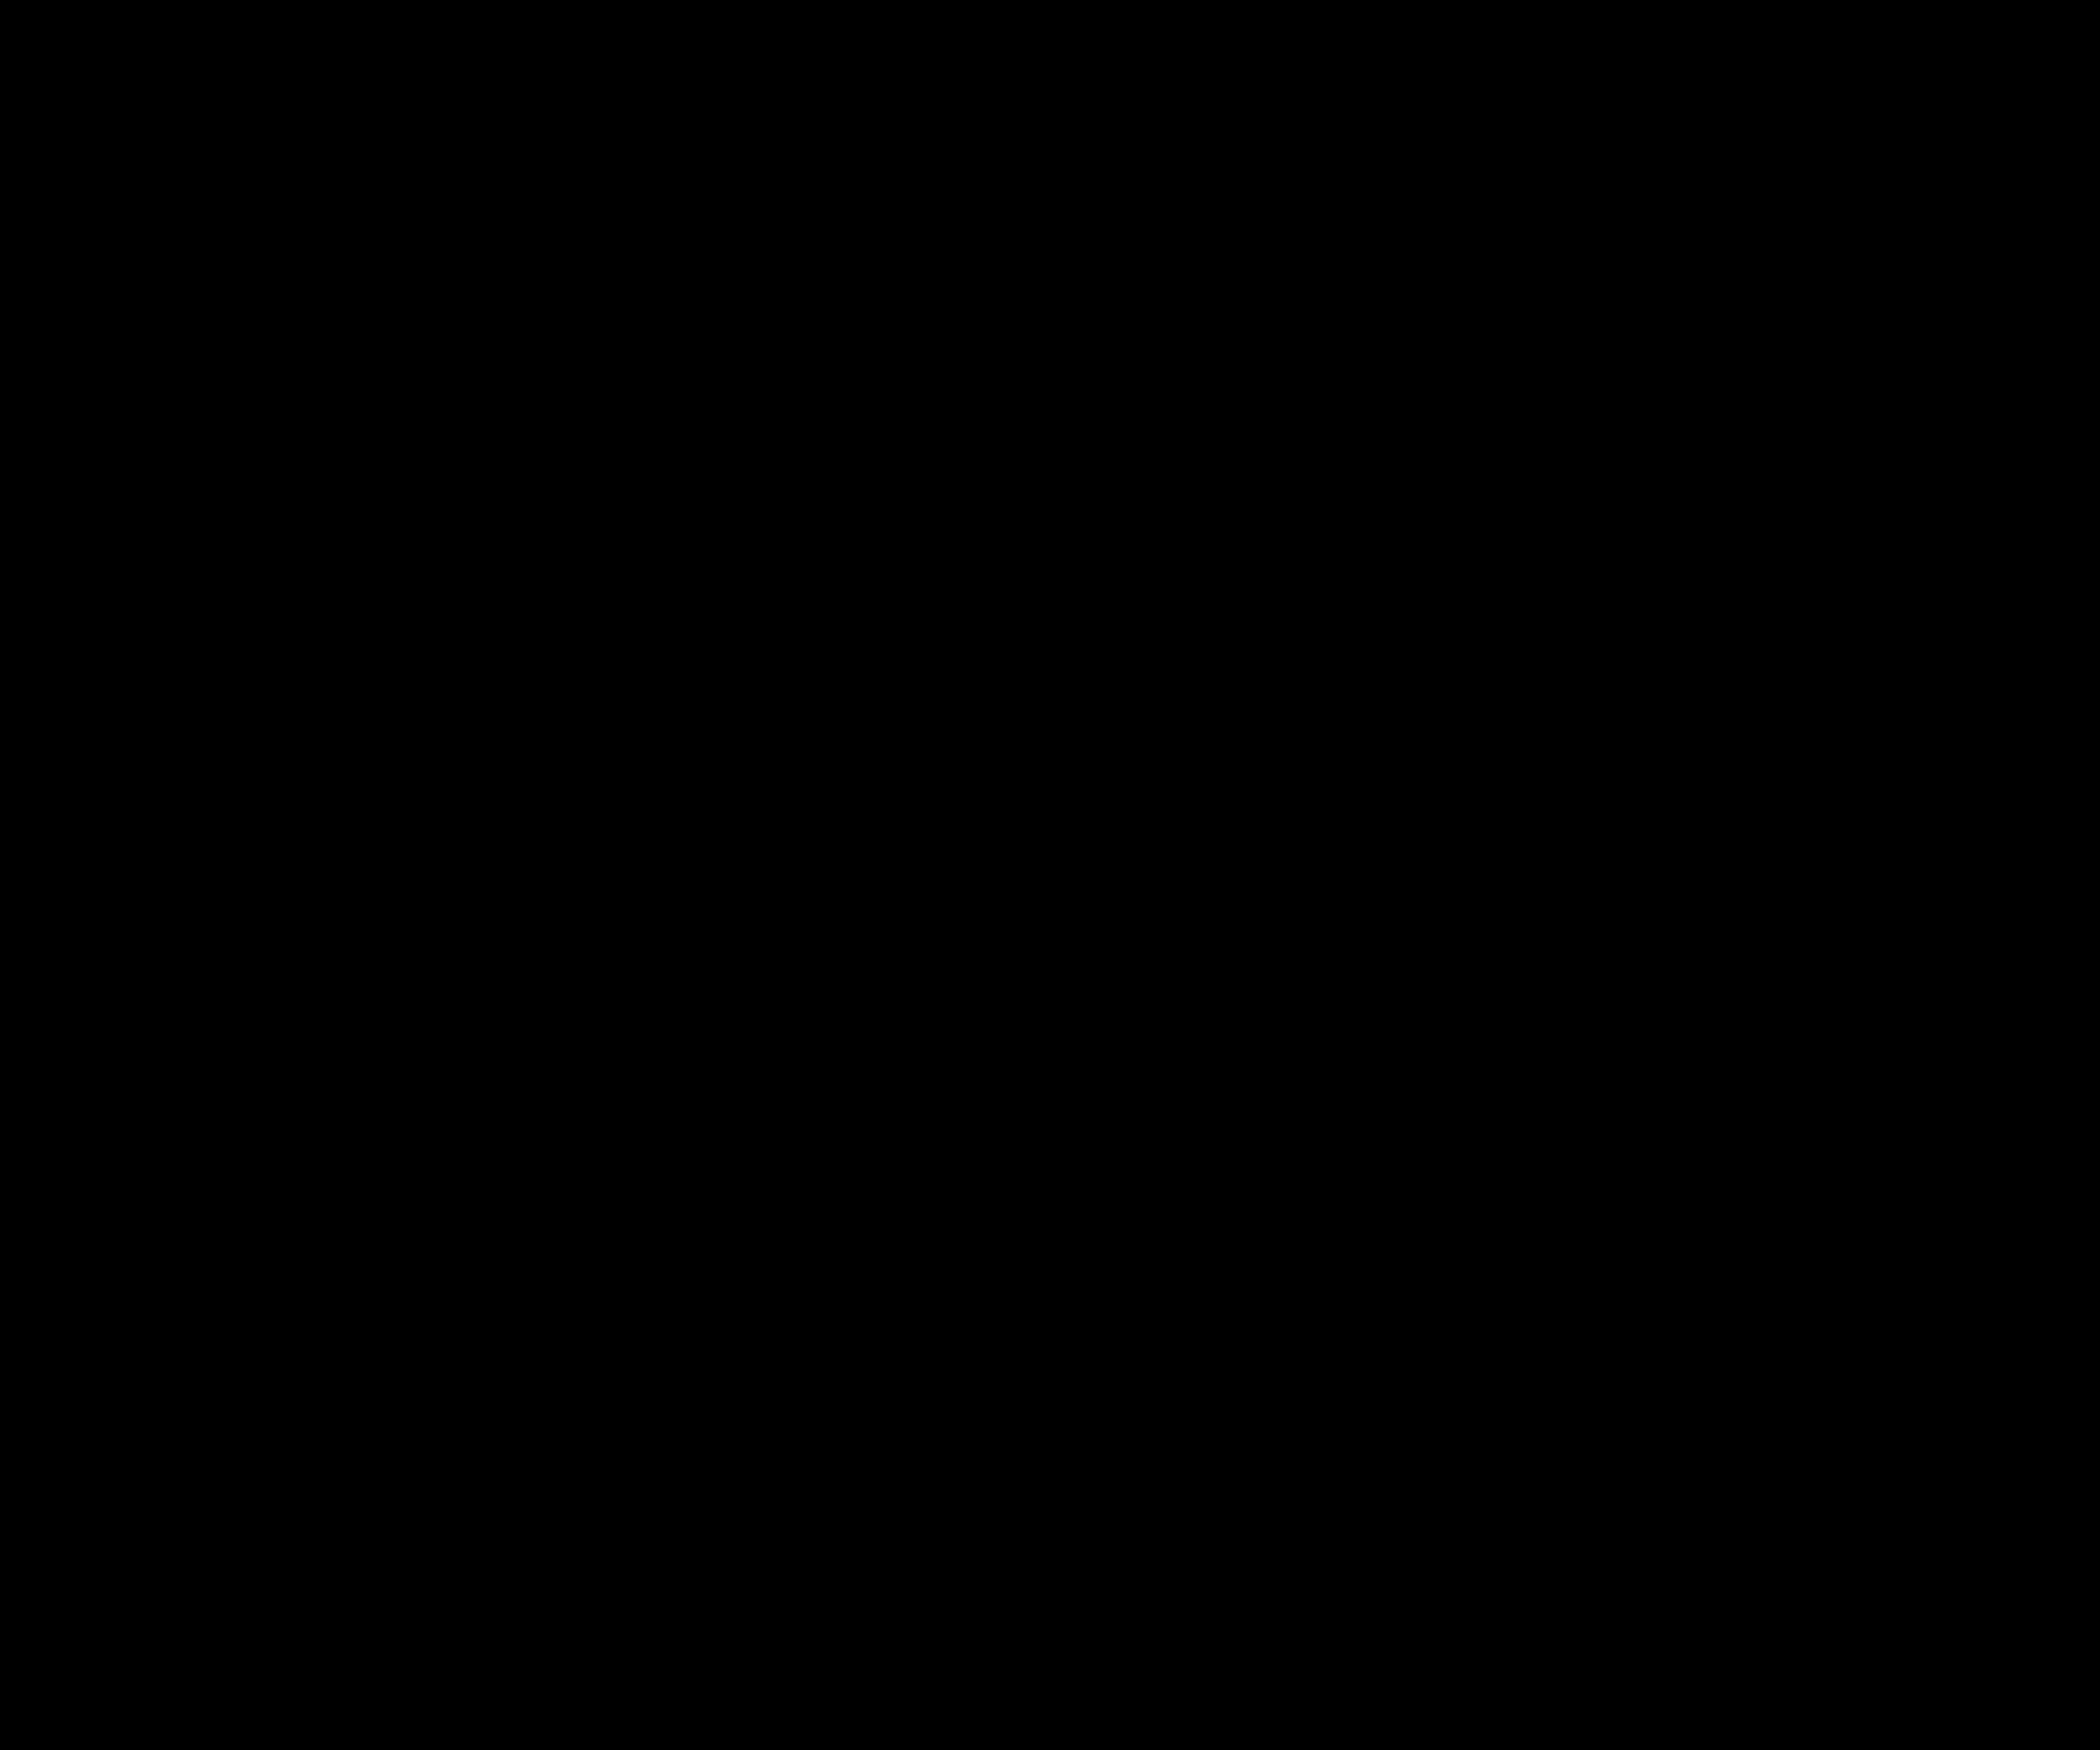 Pig Outline Clipart - Clipart Suggest